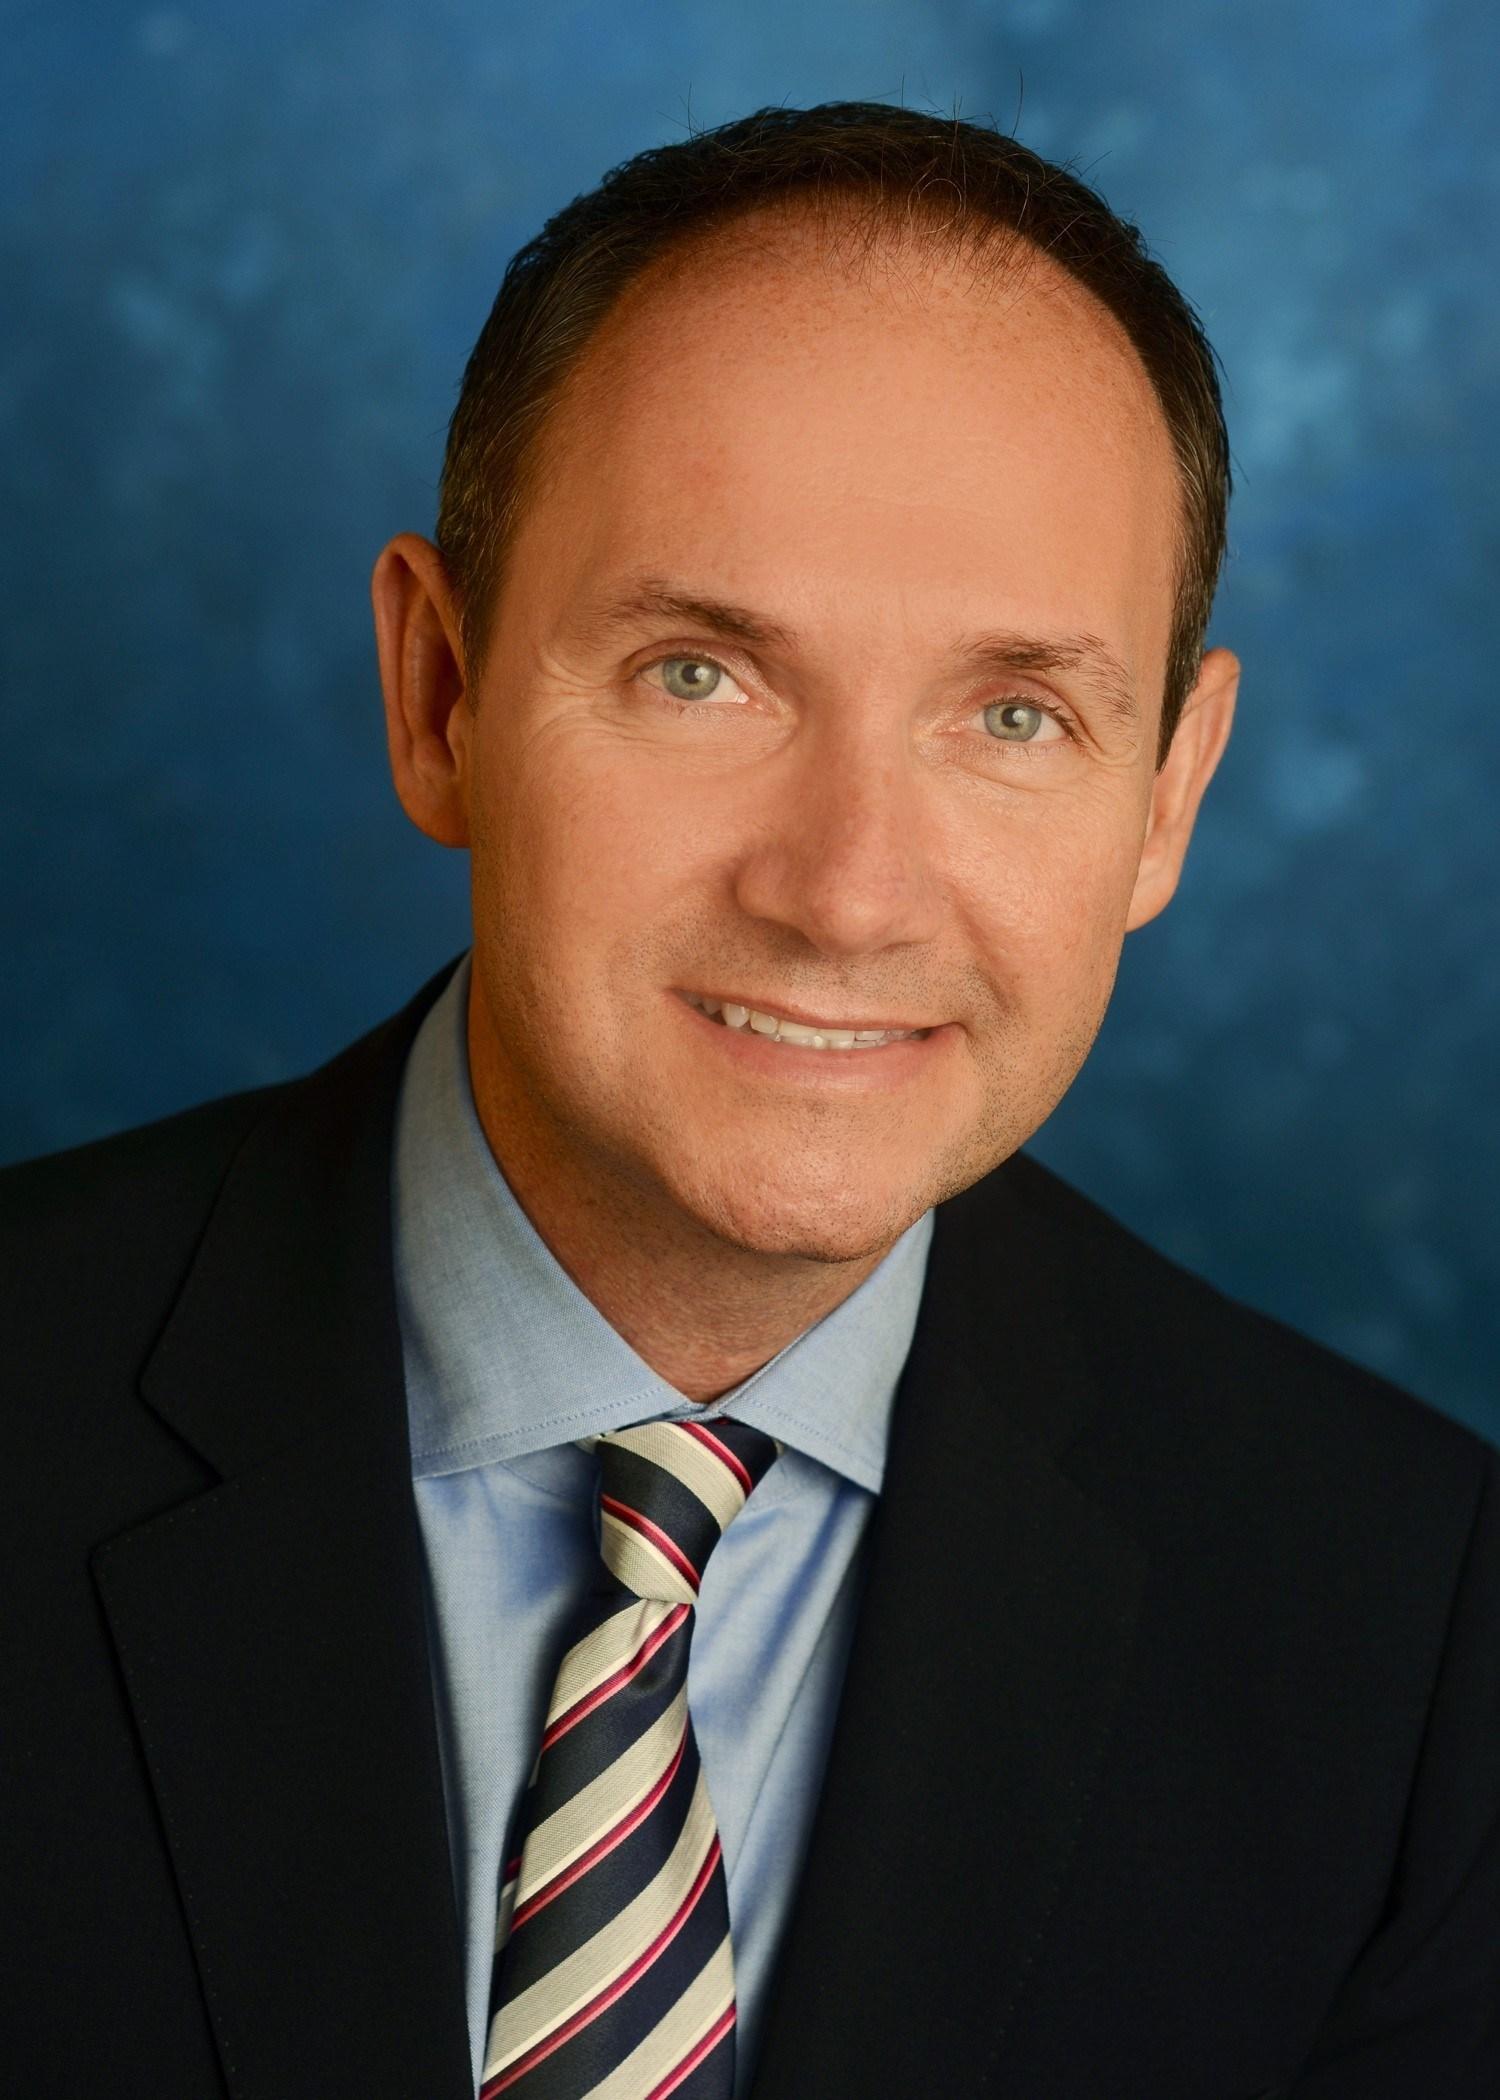 AMN Healthcare Names Dr  Cole Edmonson as New Chief Clinical Officer